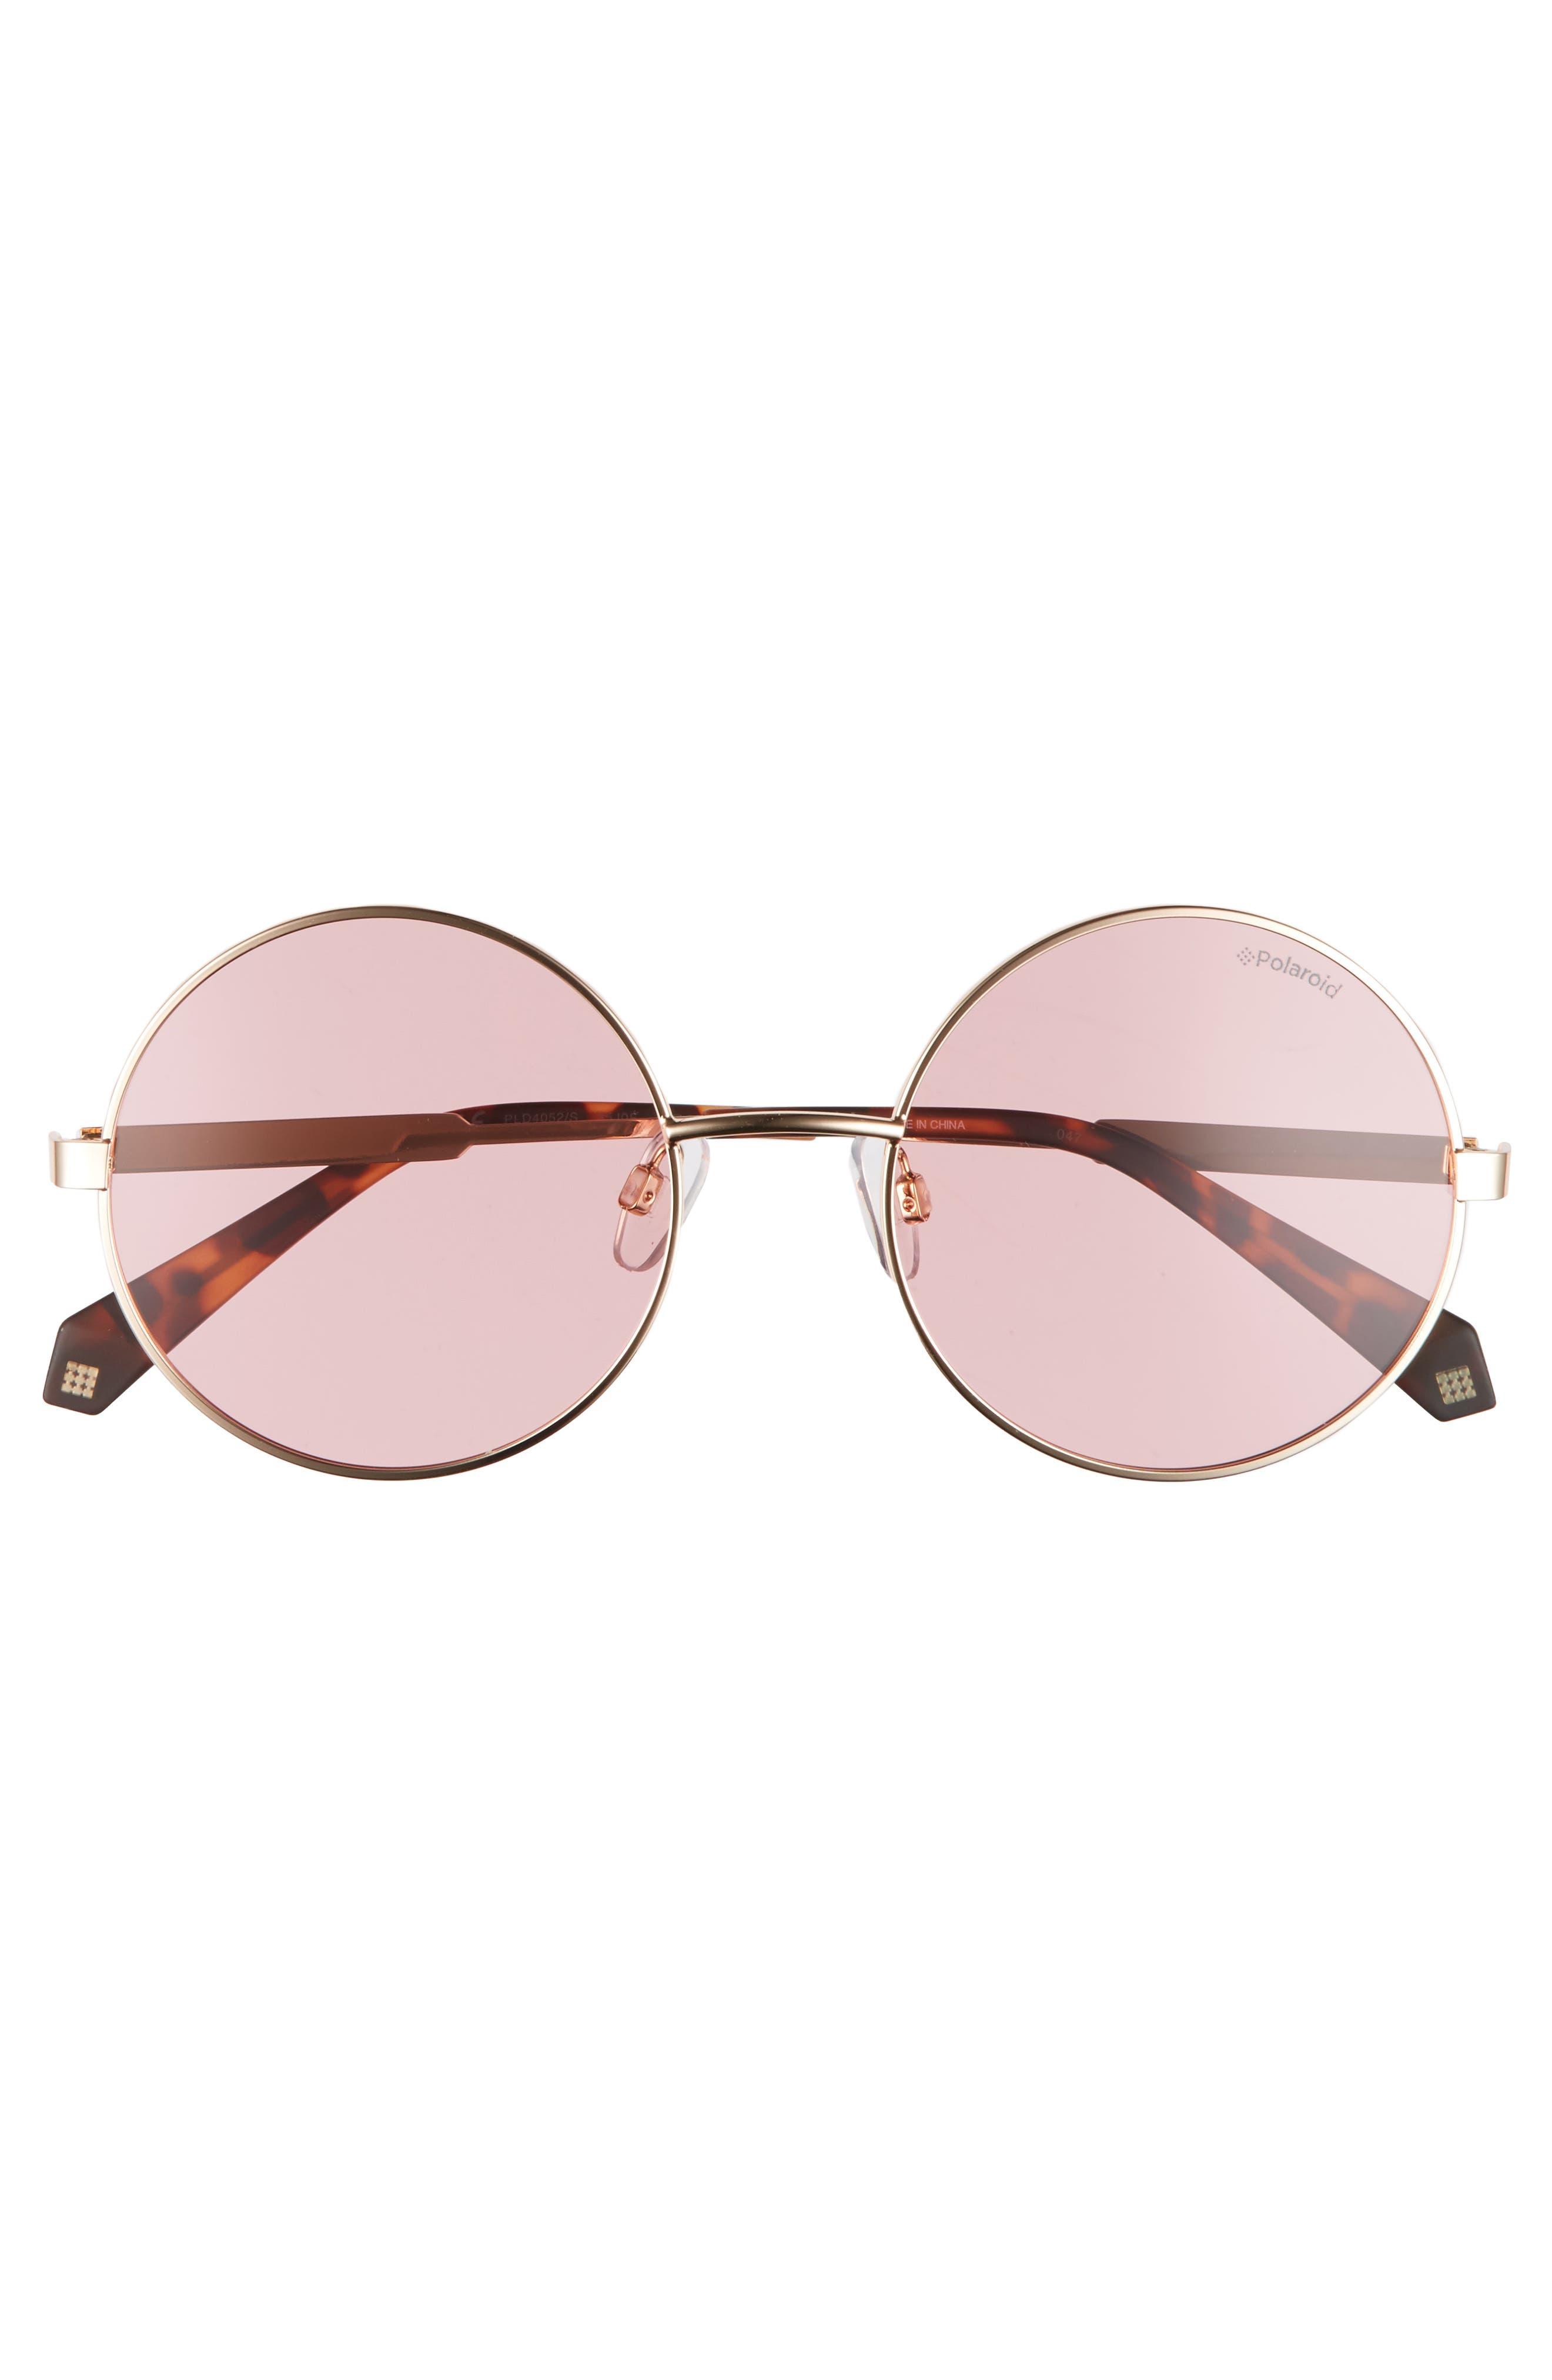 55mm Polarized Round Sunglasses,                             Alternate thumbnail 11, color,